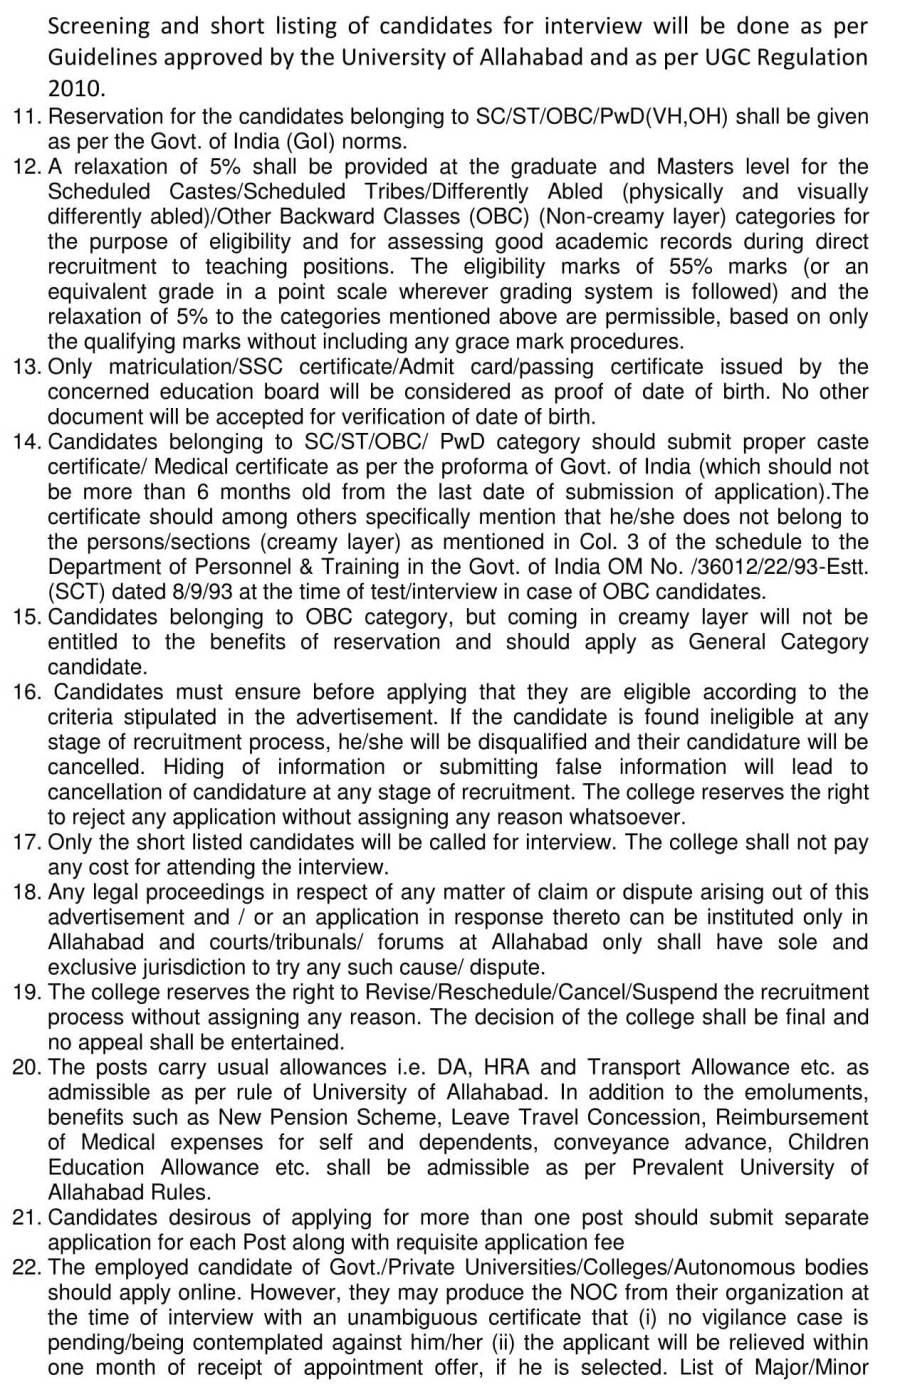 4GENERAL INSTRUCTIONS-2.jpg